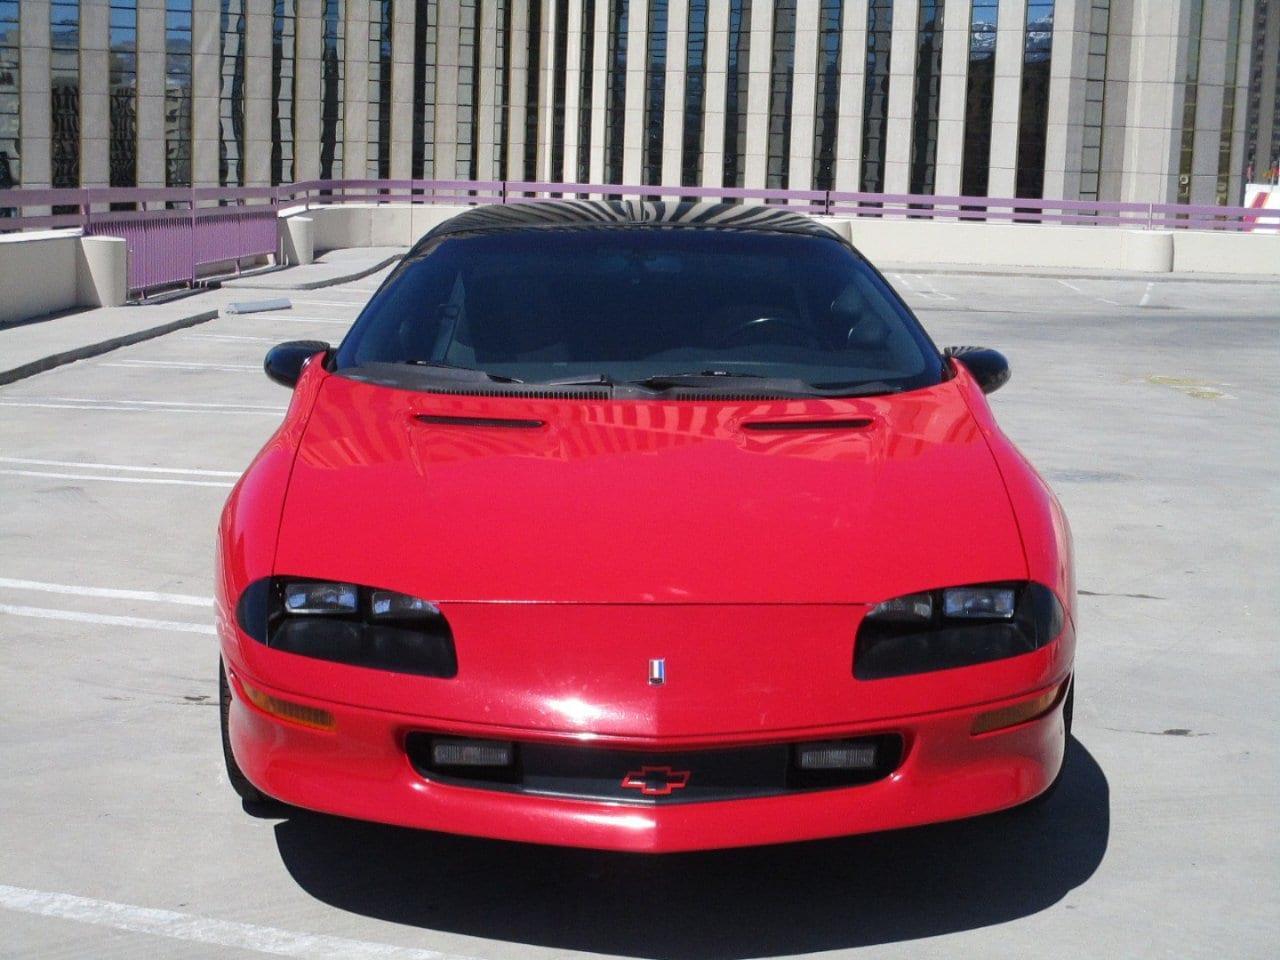 1994 Chevrolet Camaro (CC-1338415) for sale in Reno, Nevada